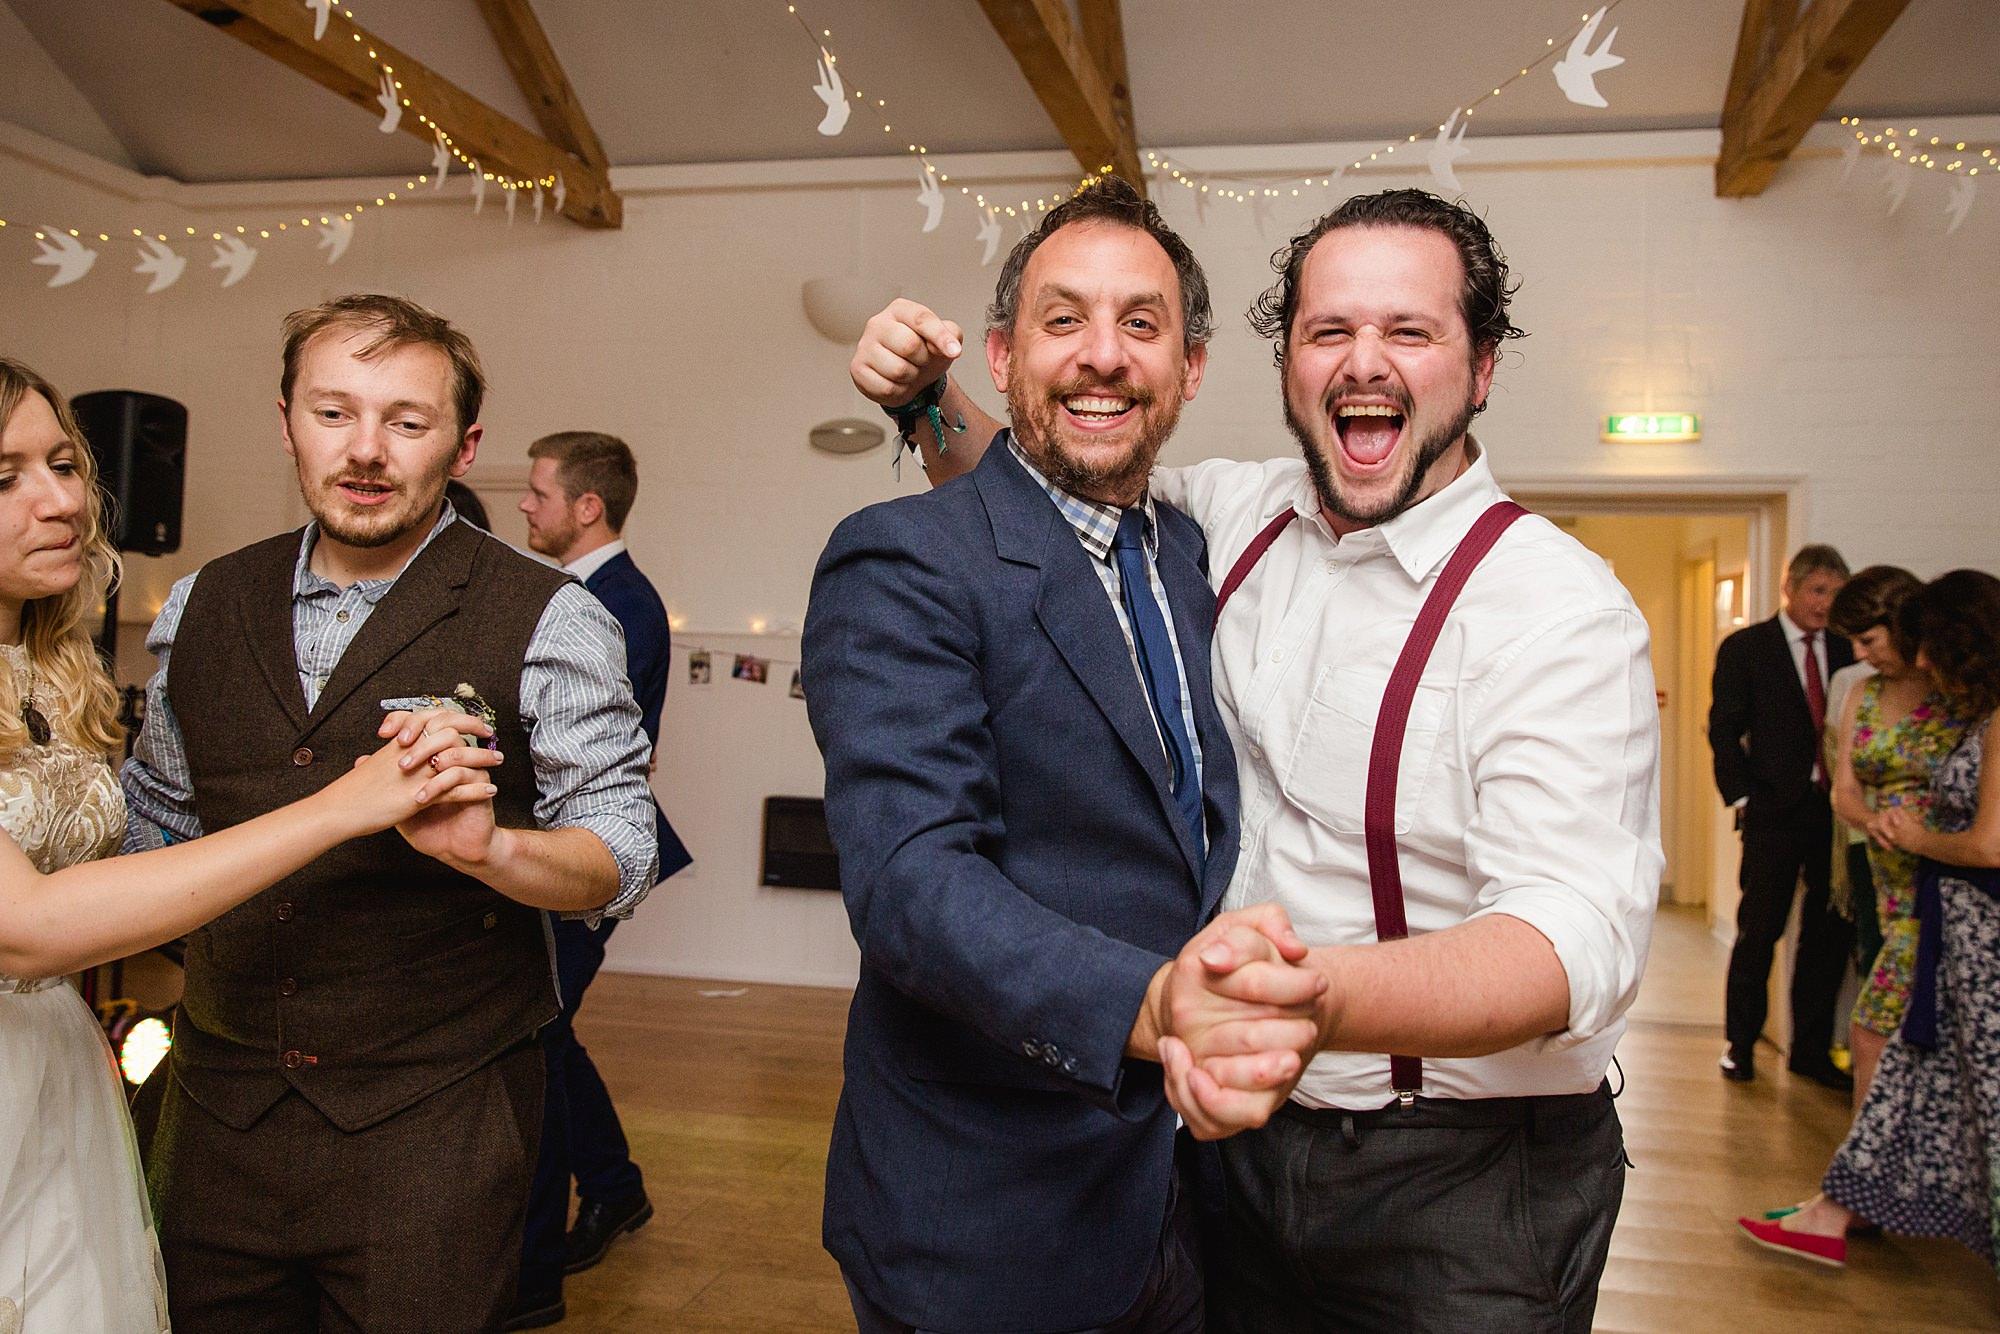 Fun village hall wedding groomsmen laughing during ceilidh